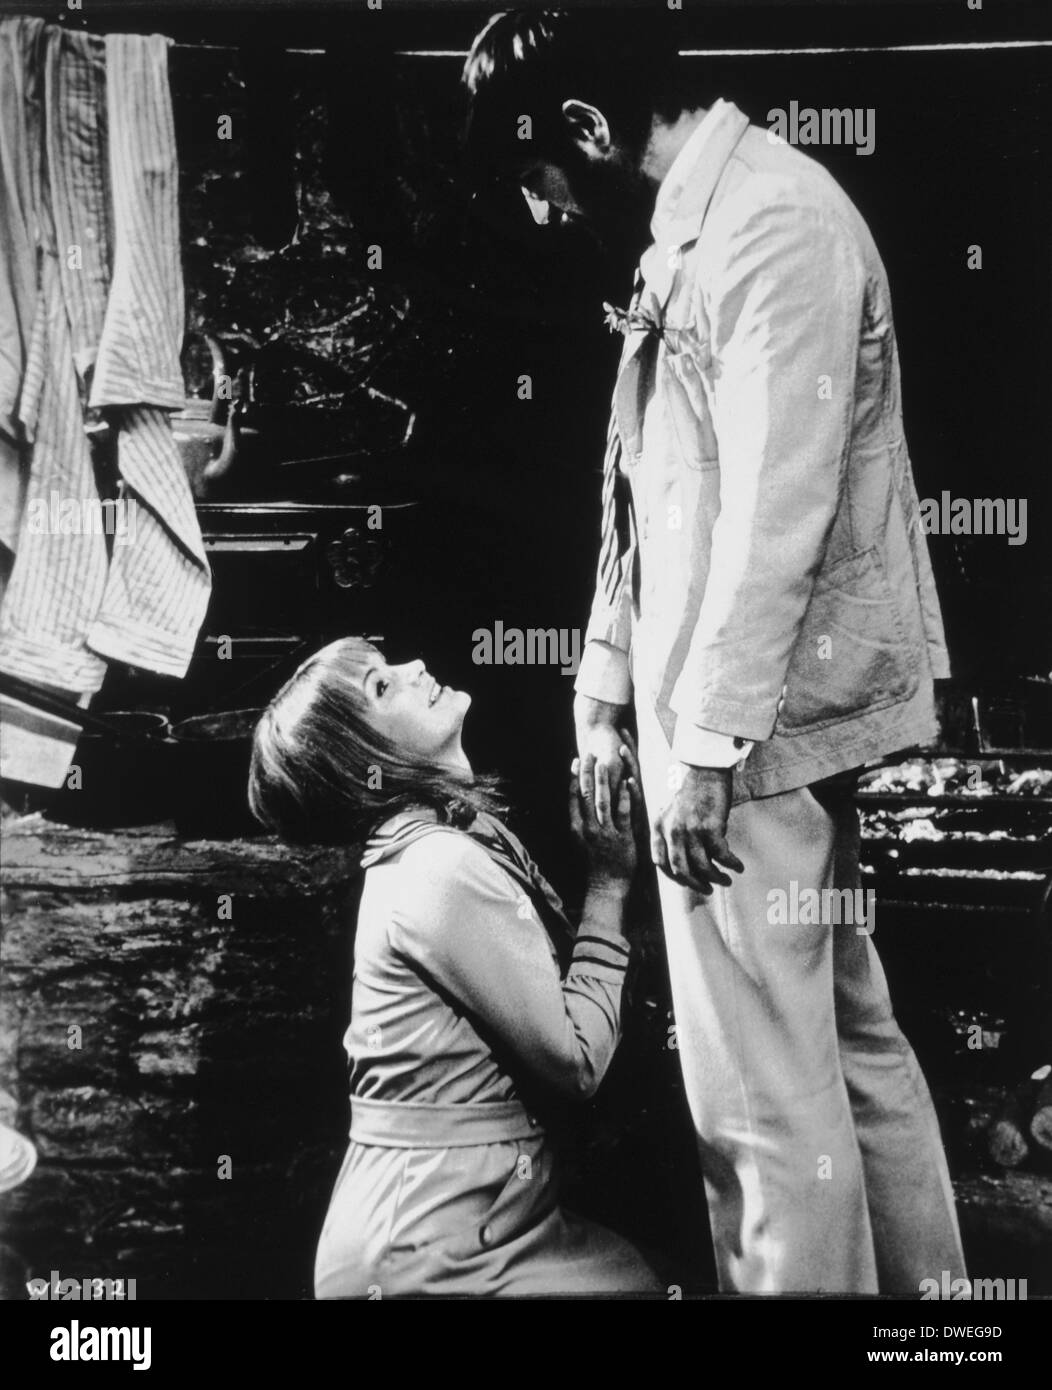 Glenda Jackson and Alan Bates, on-set of the Film, 'Women in Love', 1970 - Stock Image